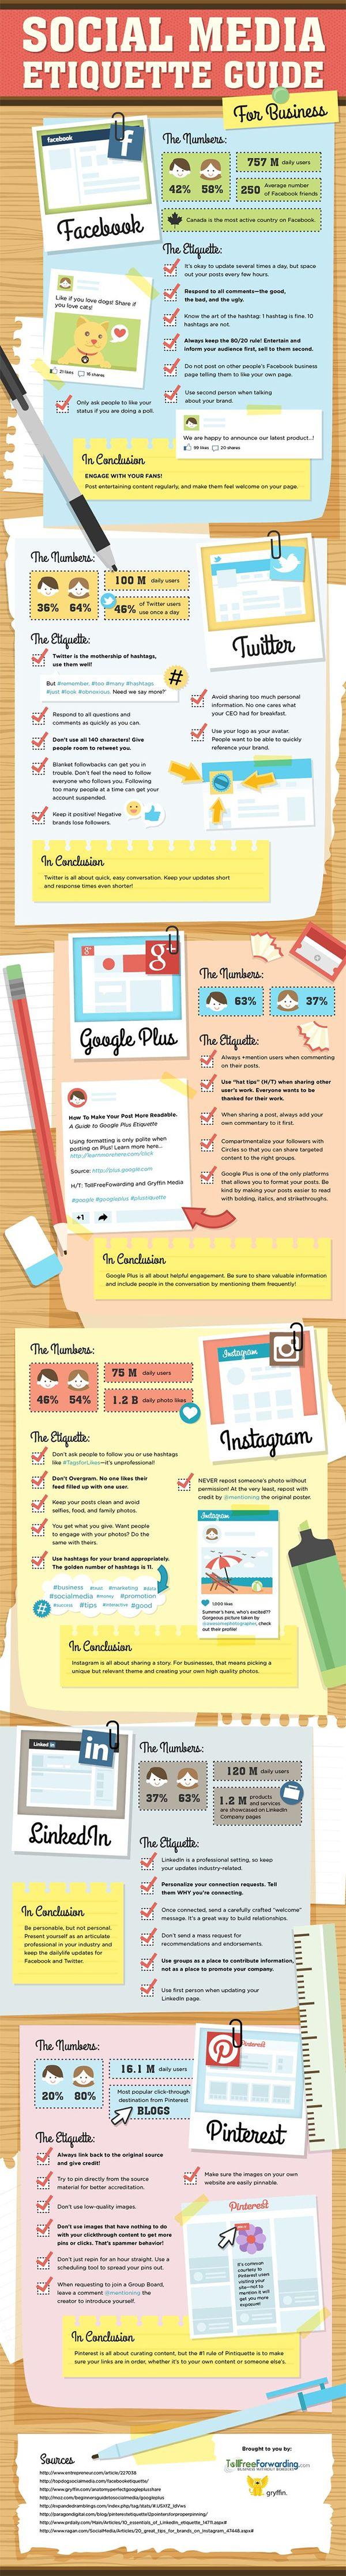 38 Social Media Etiquette Rules You Must Follow